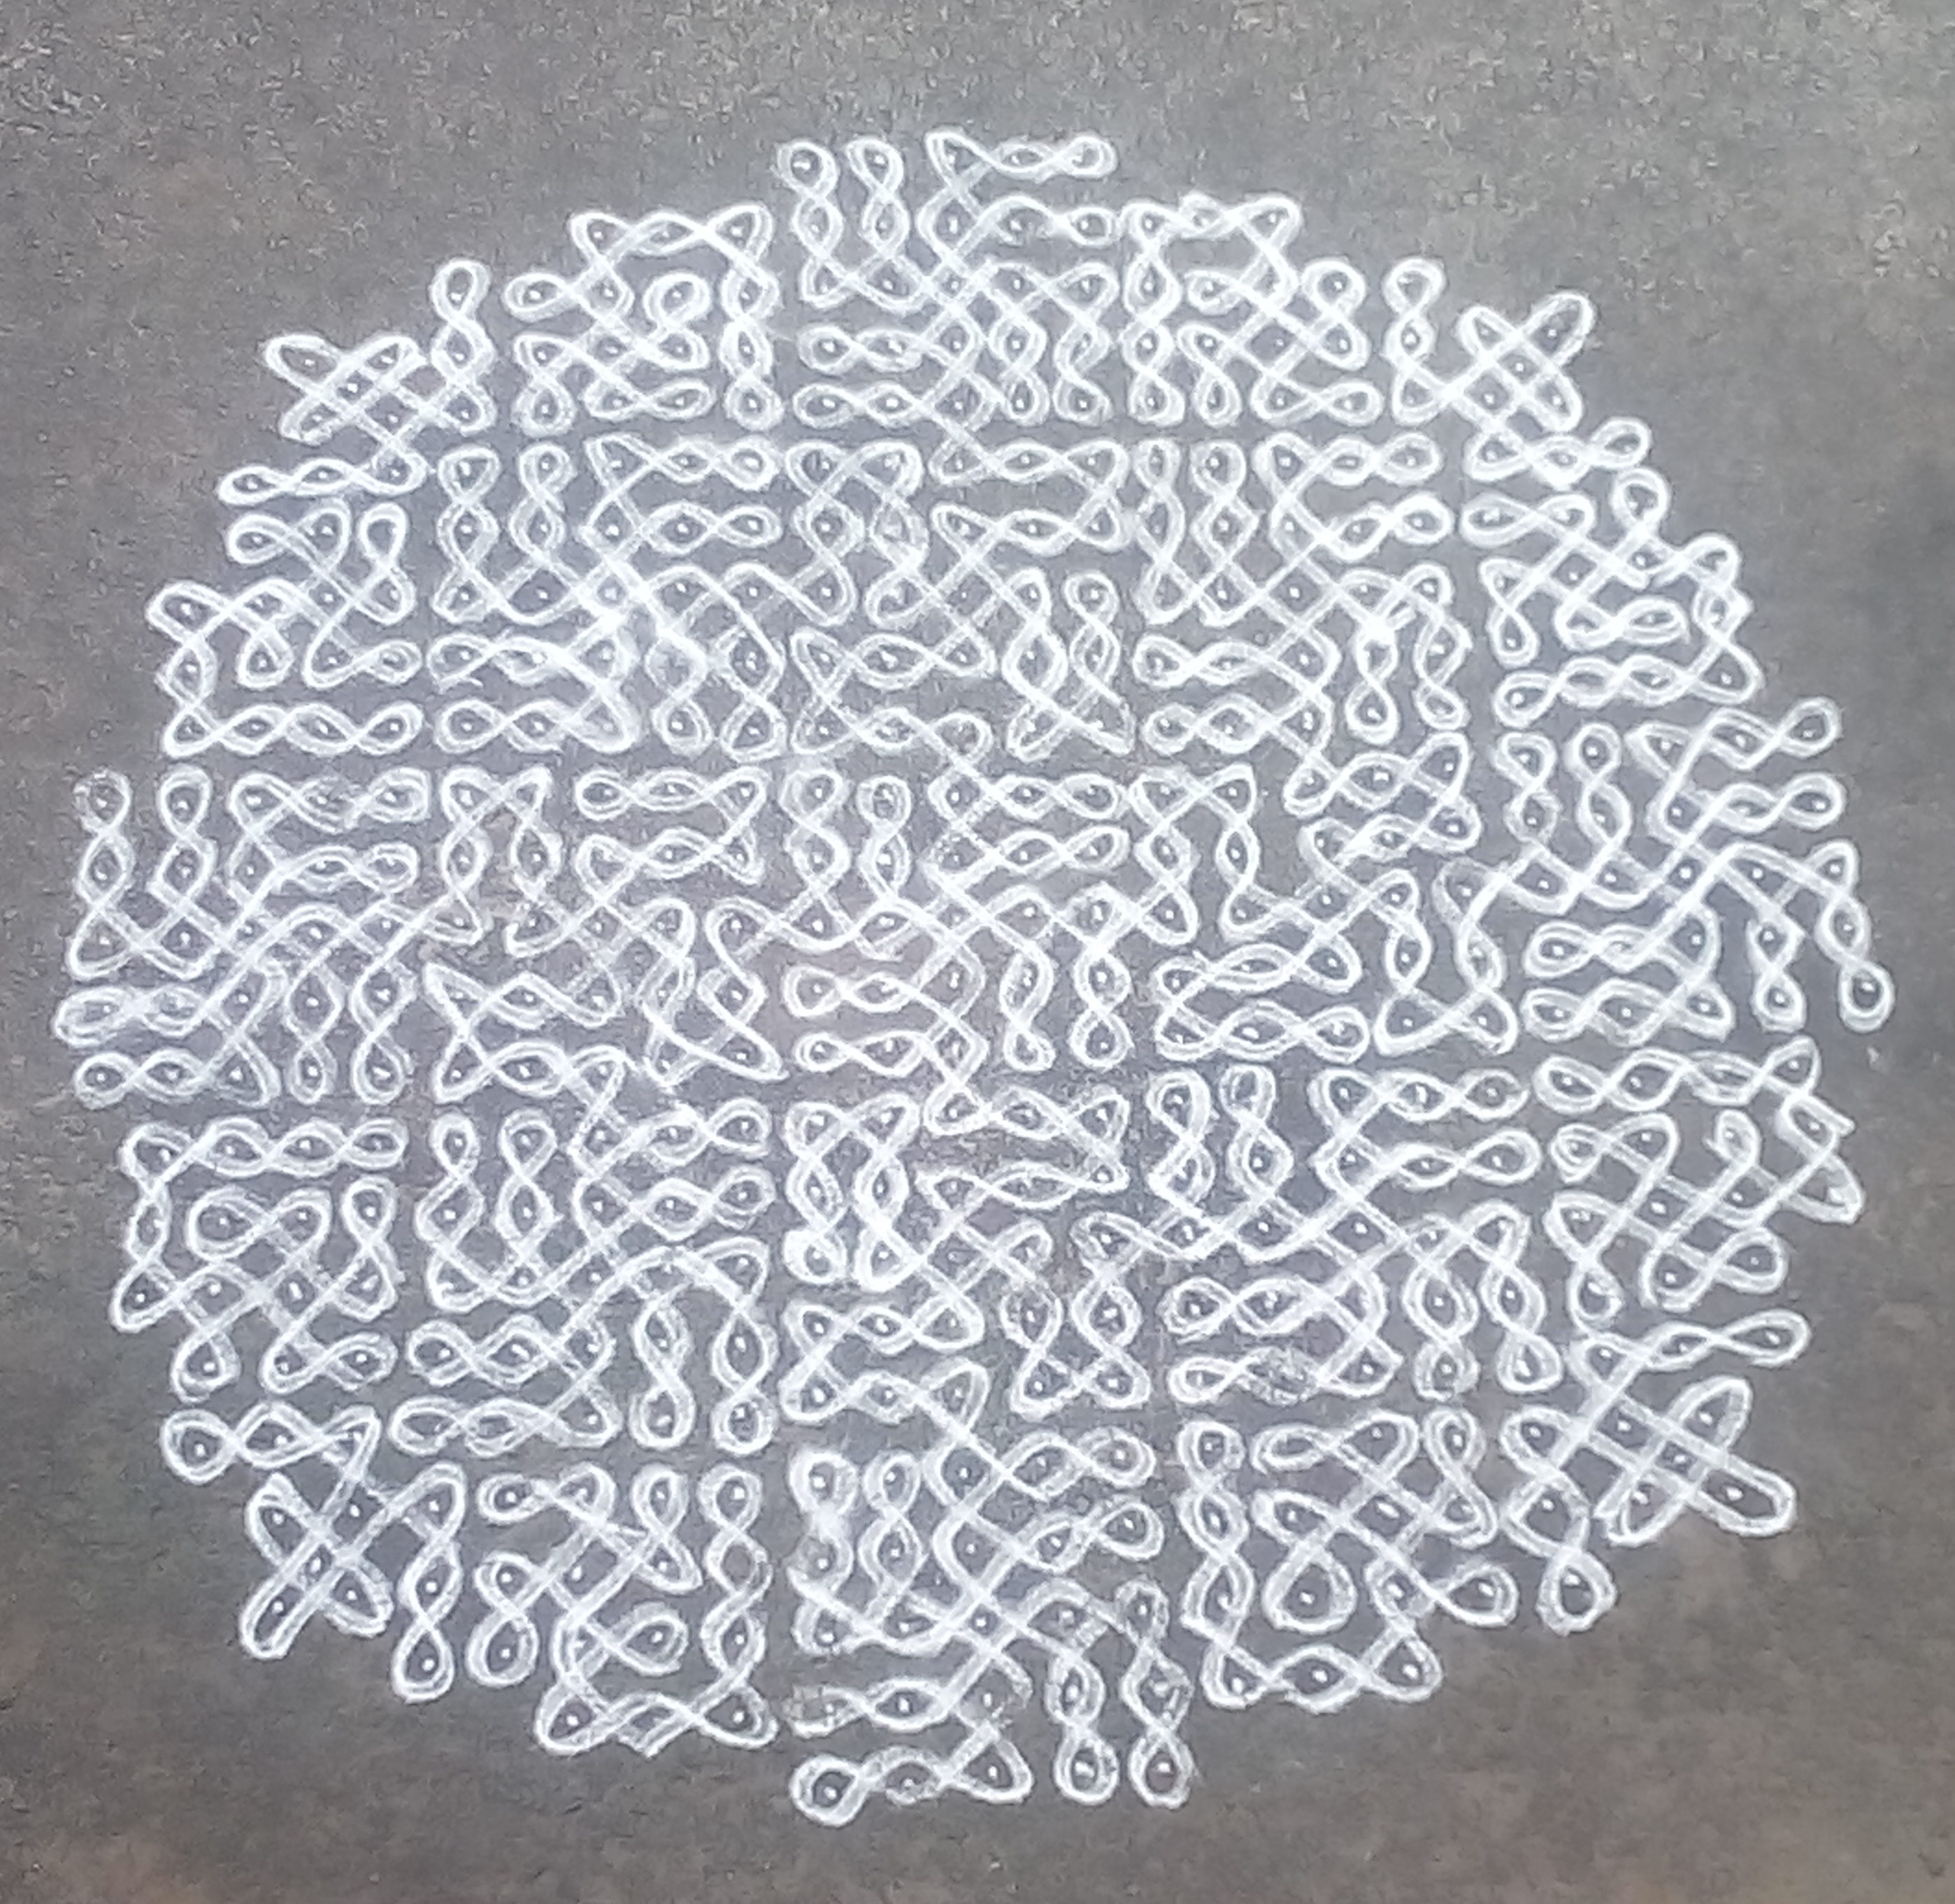 Sikku kolam with 25 dots || chikku kolam for Contest